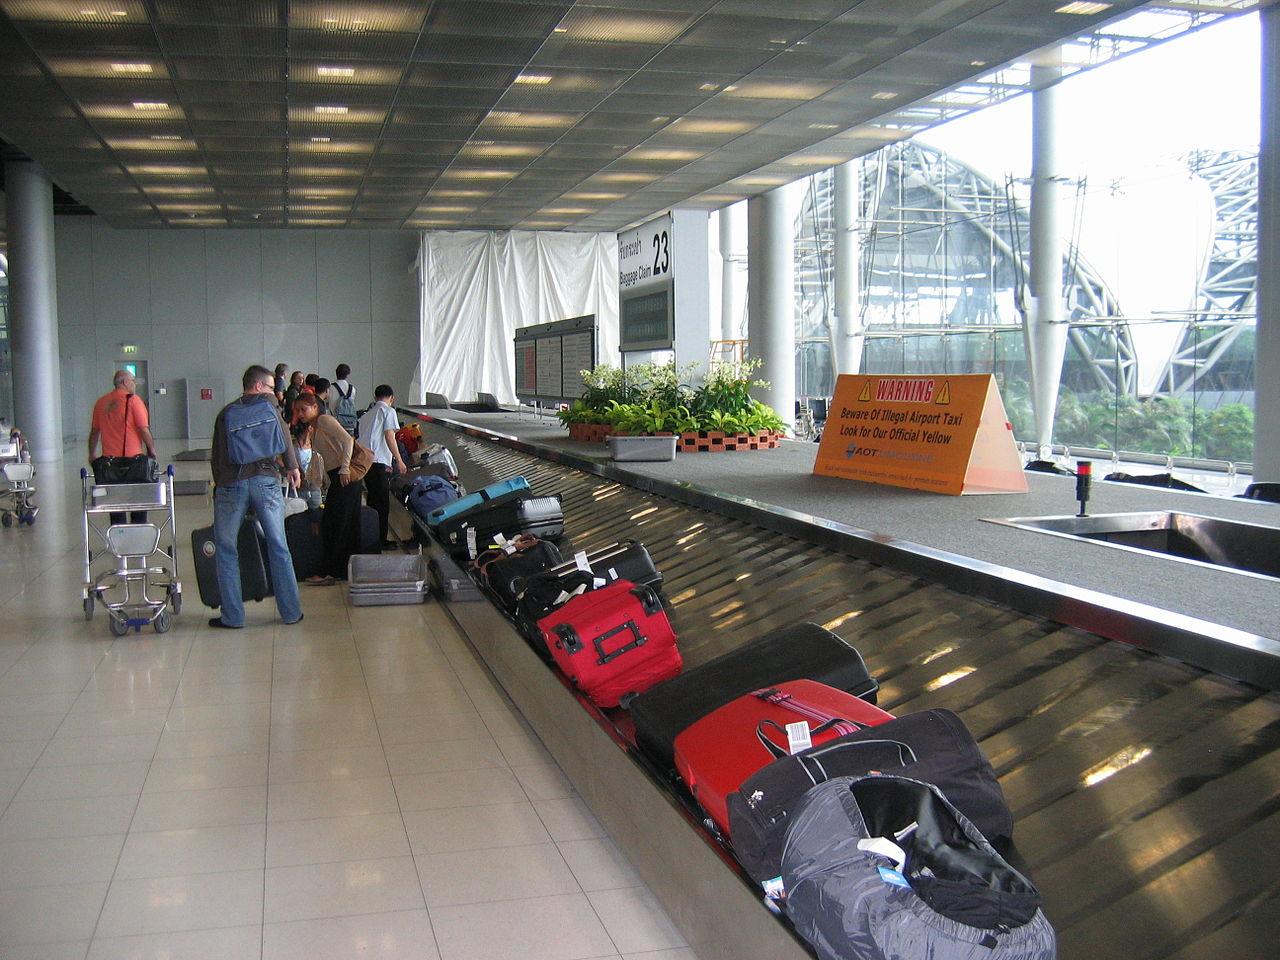 Baggage belt at Suvarnabhumi Airport